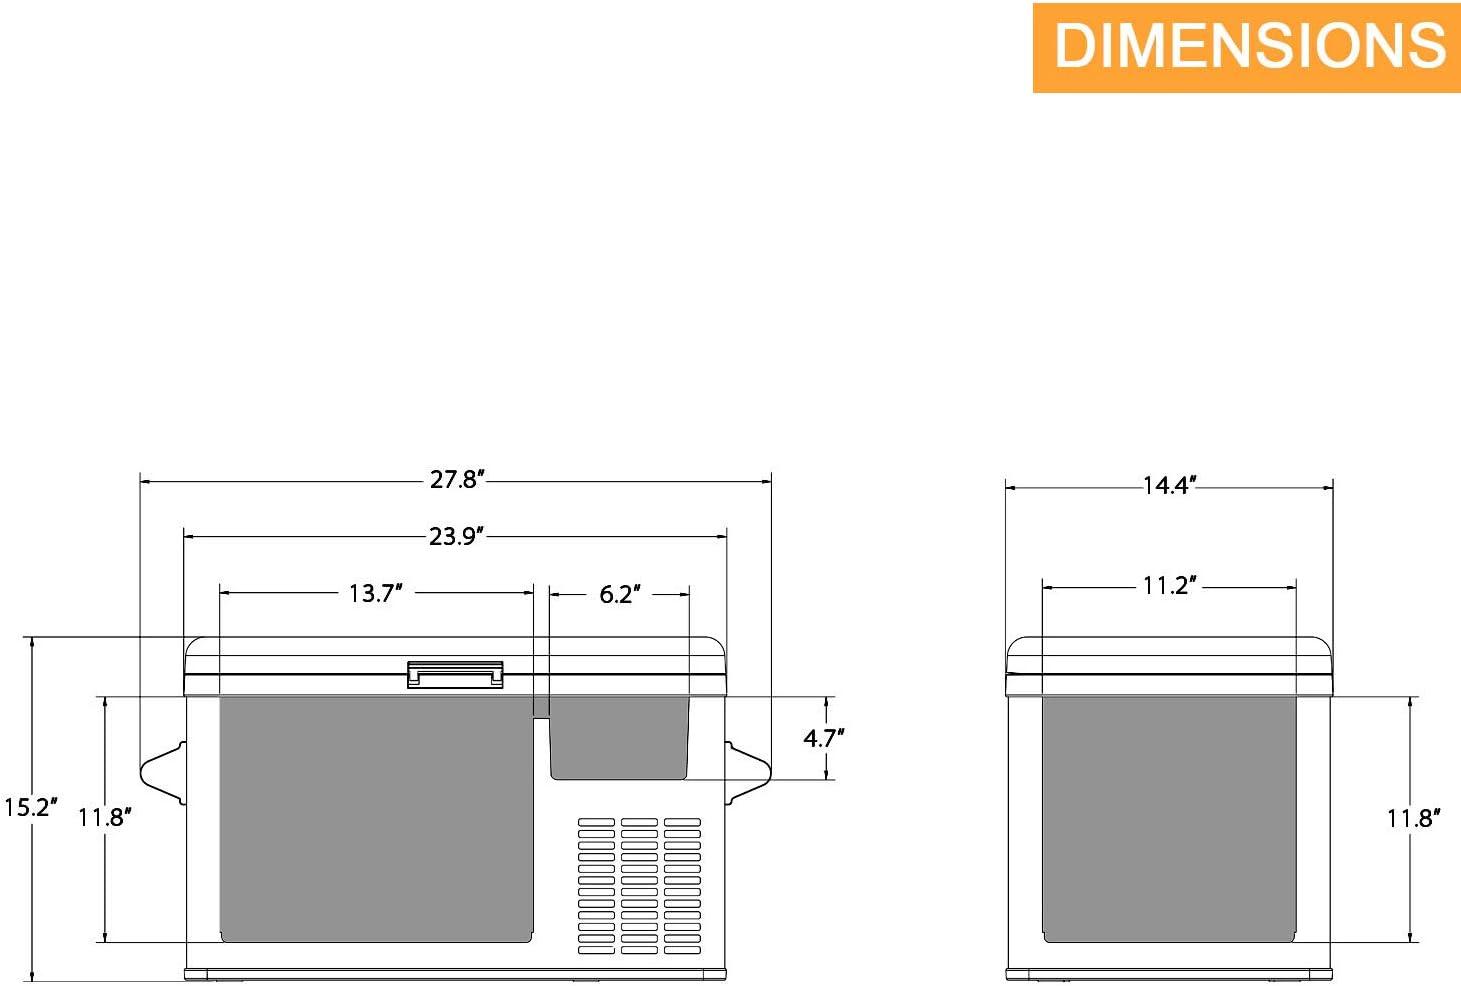 Aspenora 37-Quart Portable Fridge Freezer 12V Car Refrigerator Car Fridge with Compressor Touch Screen for Vehicle Truck RV Camping Travel Outdoor Driving 37-Quart -4℉ ~ 68℉ 12//24V DC and 110V AC